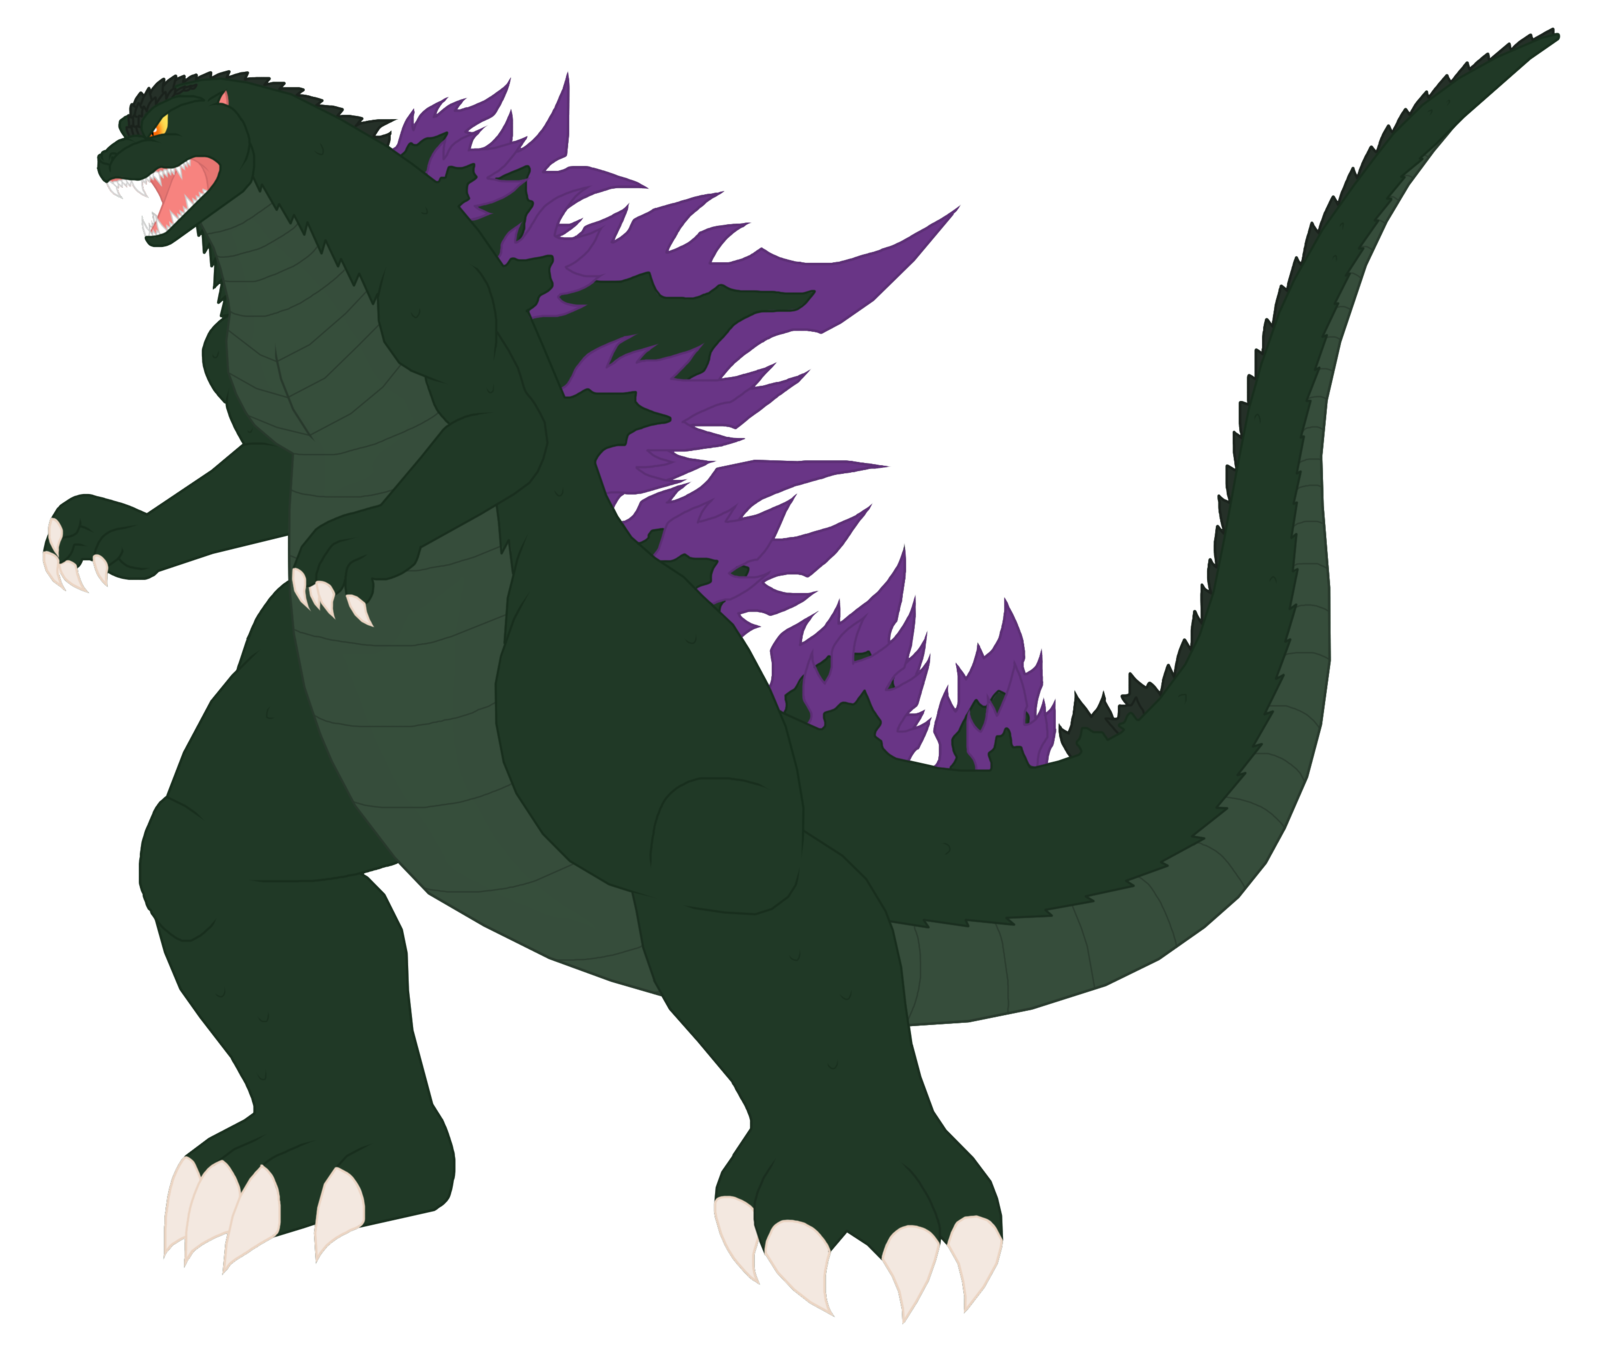 Godzilla clipart transparent Sonichedgehog2 28 by favourites Godzilla